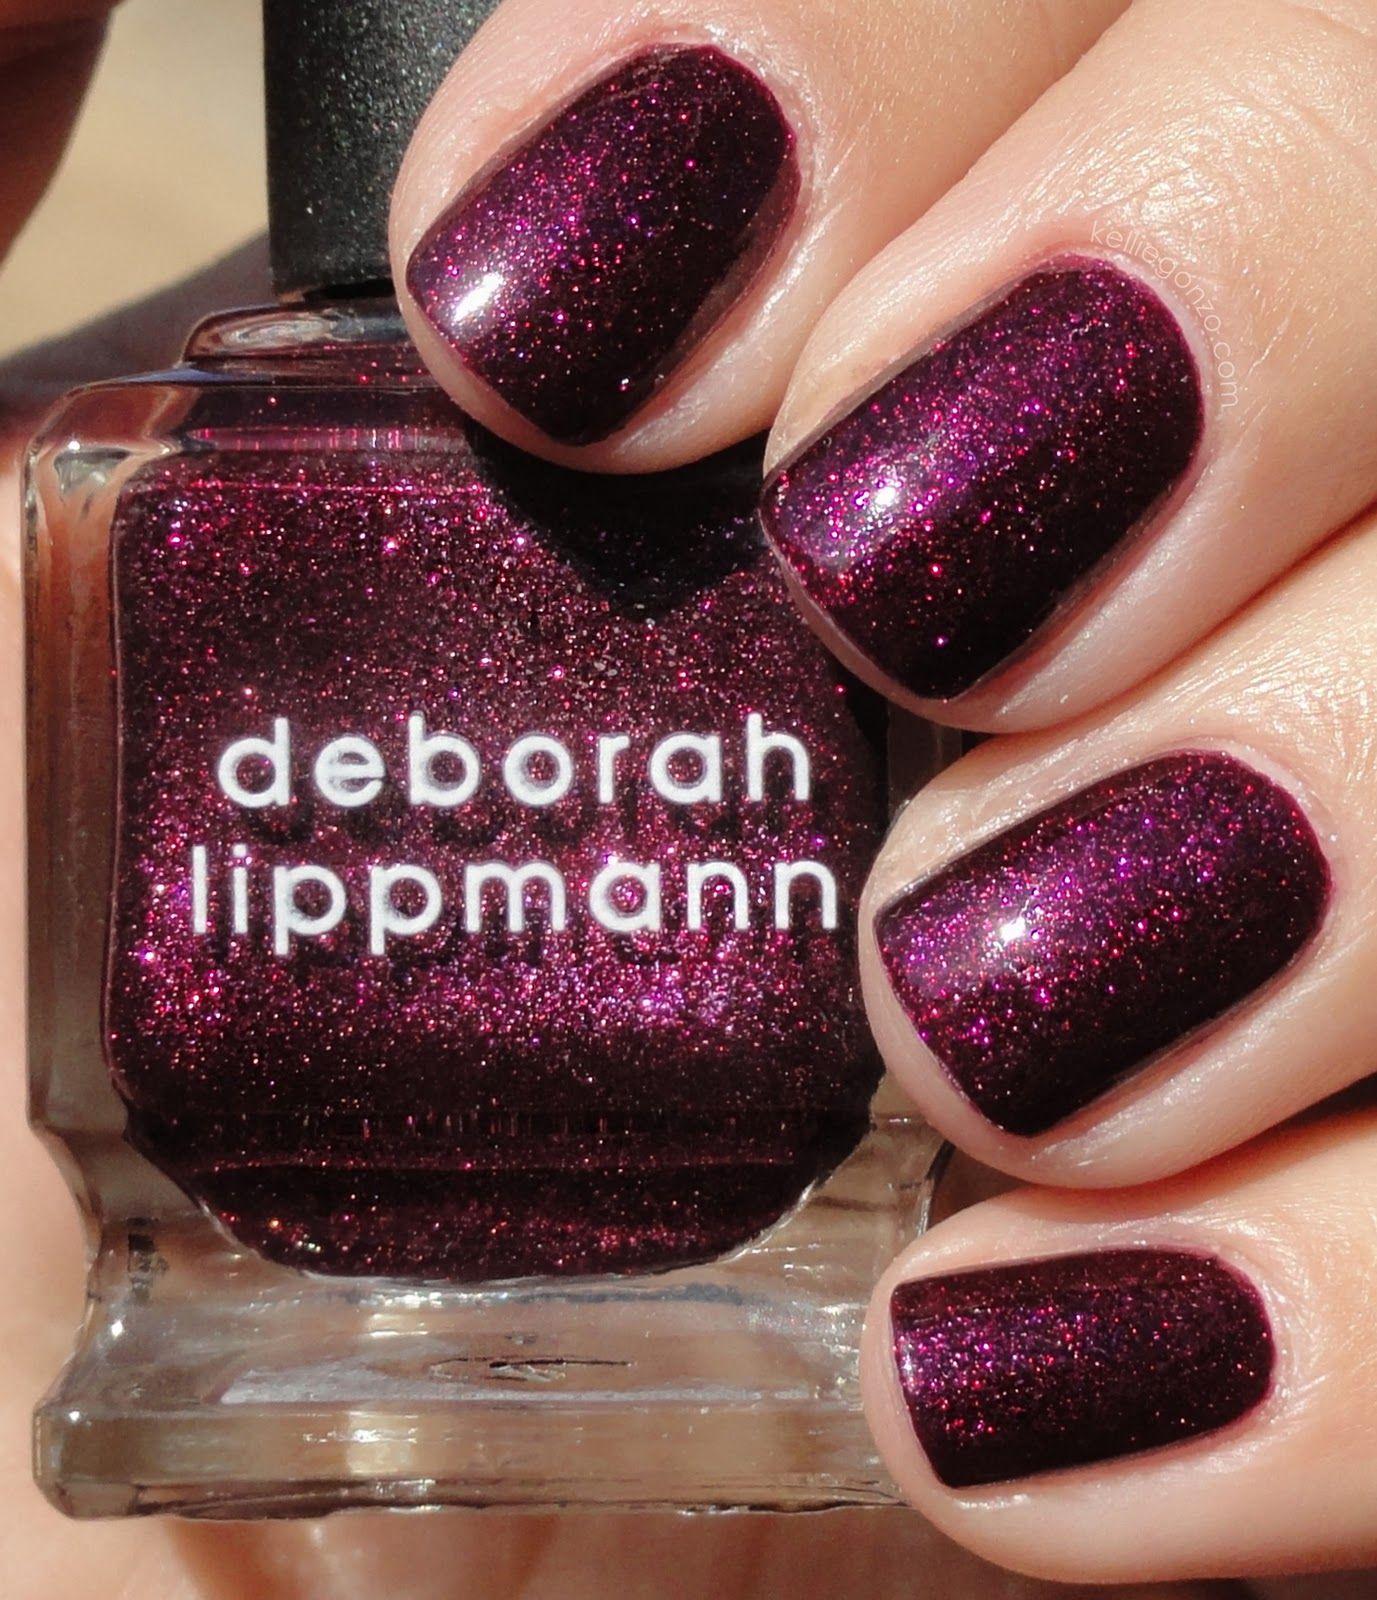 Deborah Lippmann. Good Girl Gone Bad. (y'all Should Check